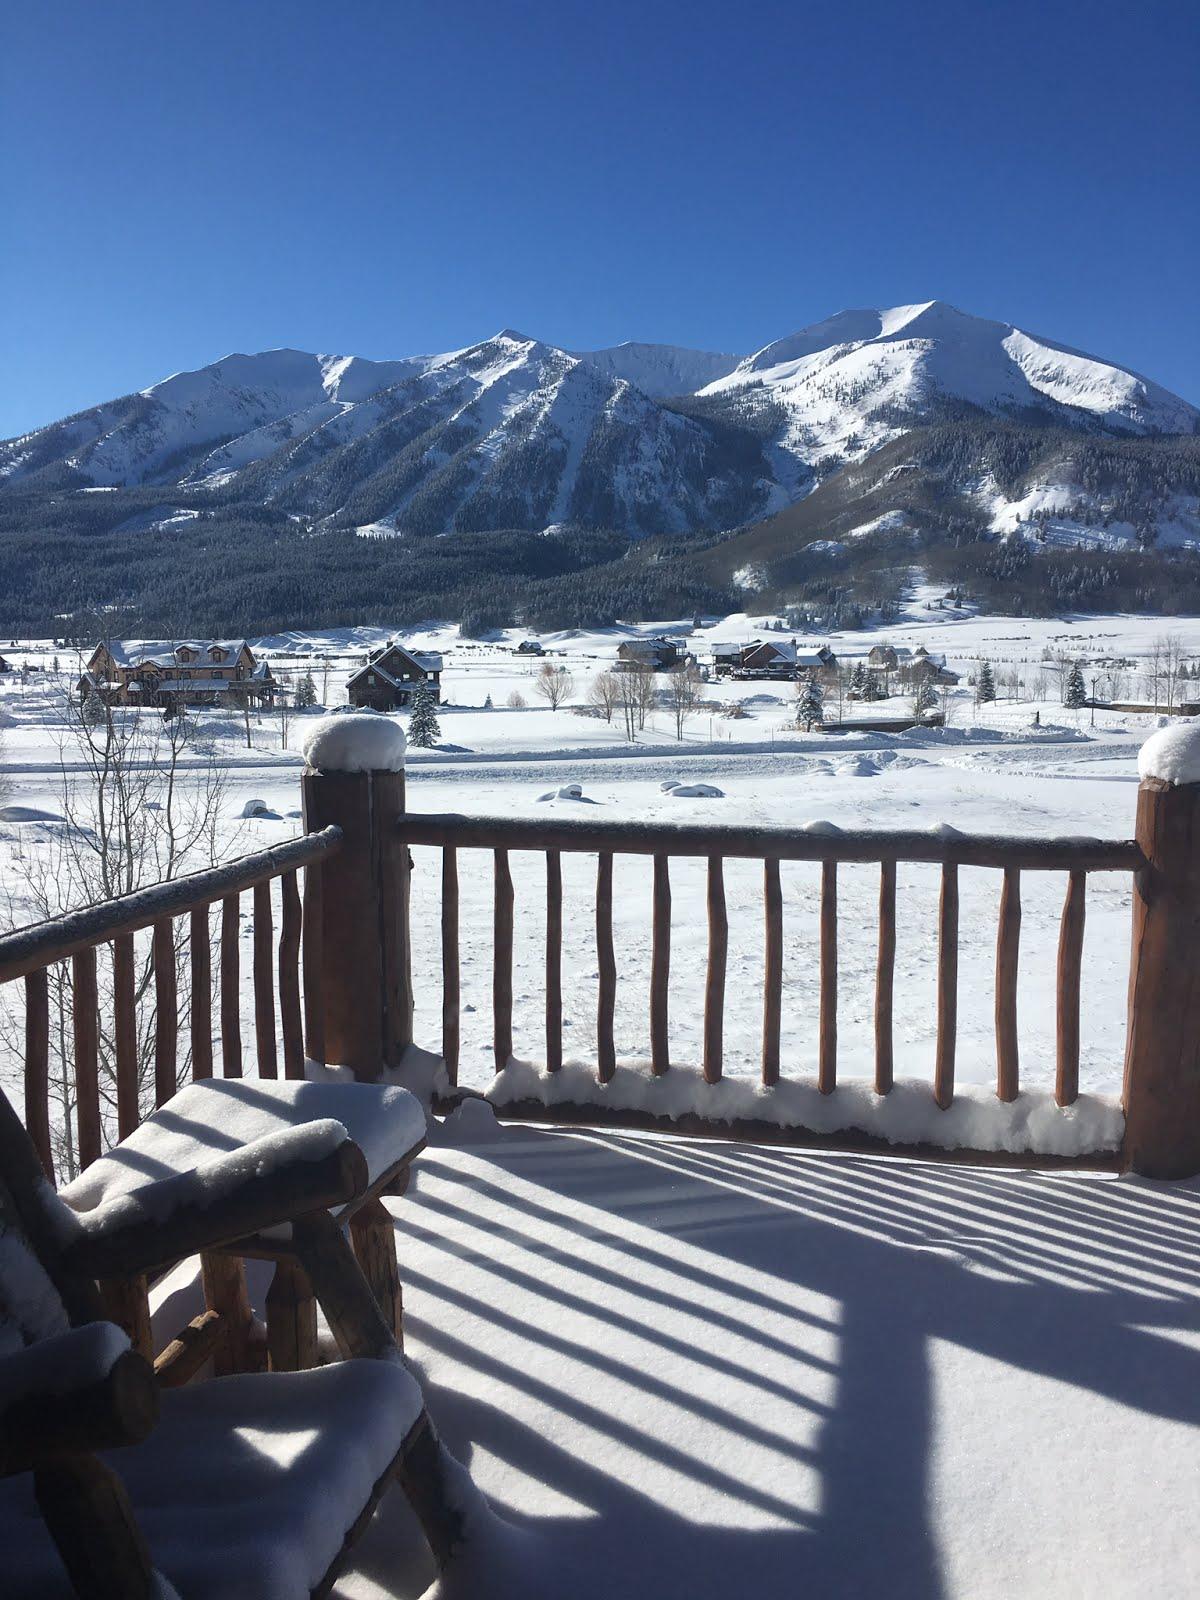 Rocky Mountain HIGH…Altitude Sickness